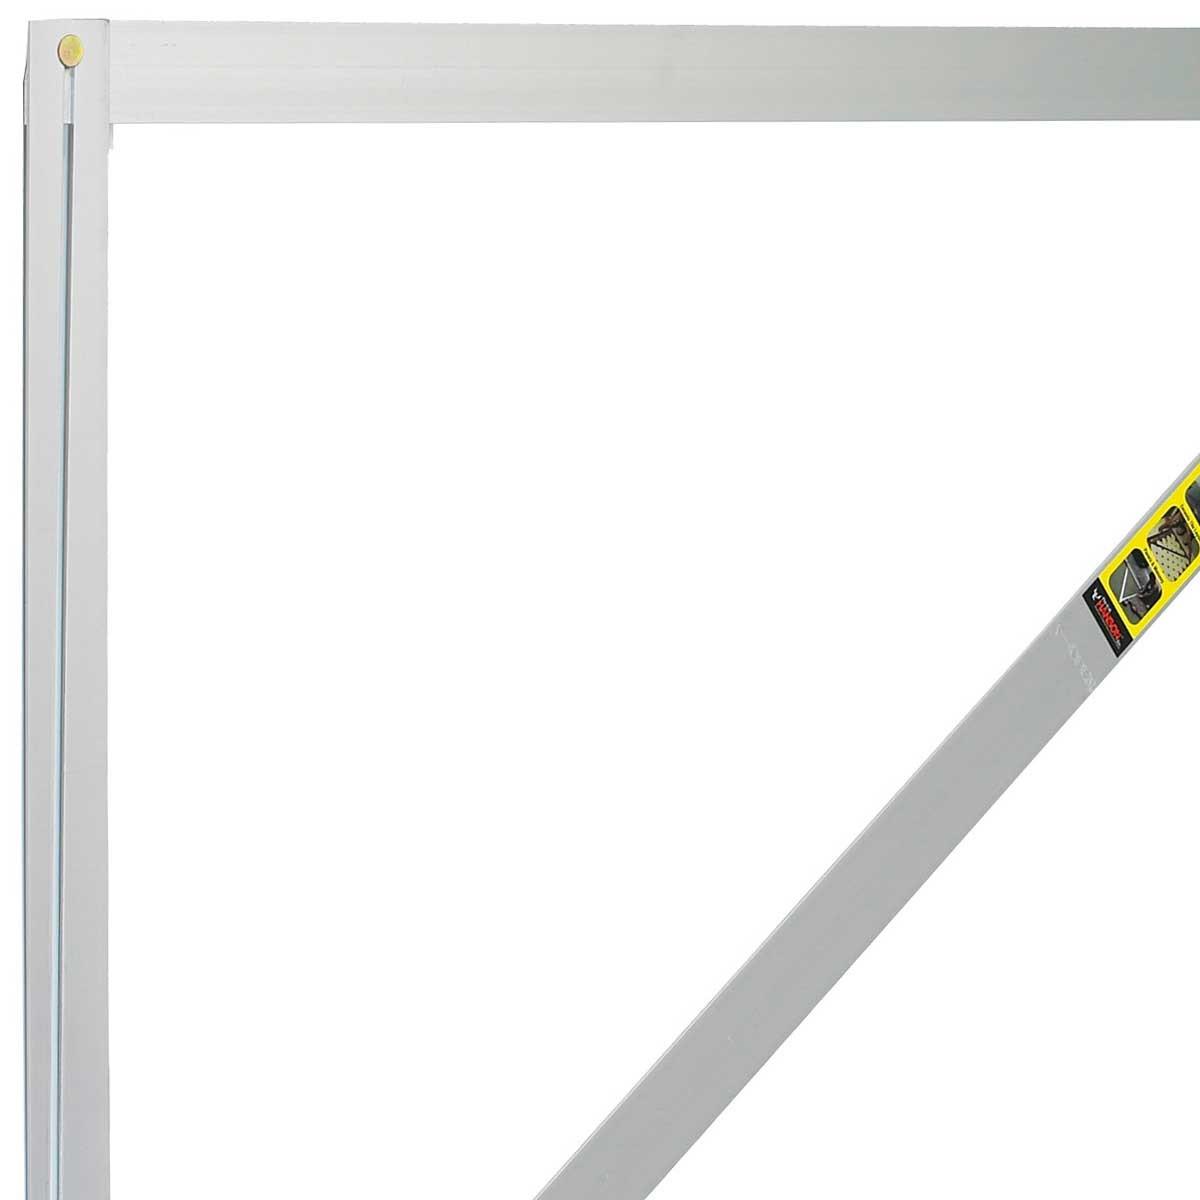 a square 3 x 4 x 5 aluminum folding layout tool